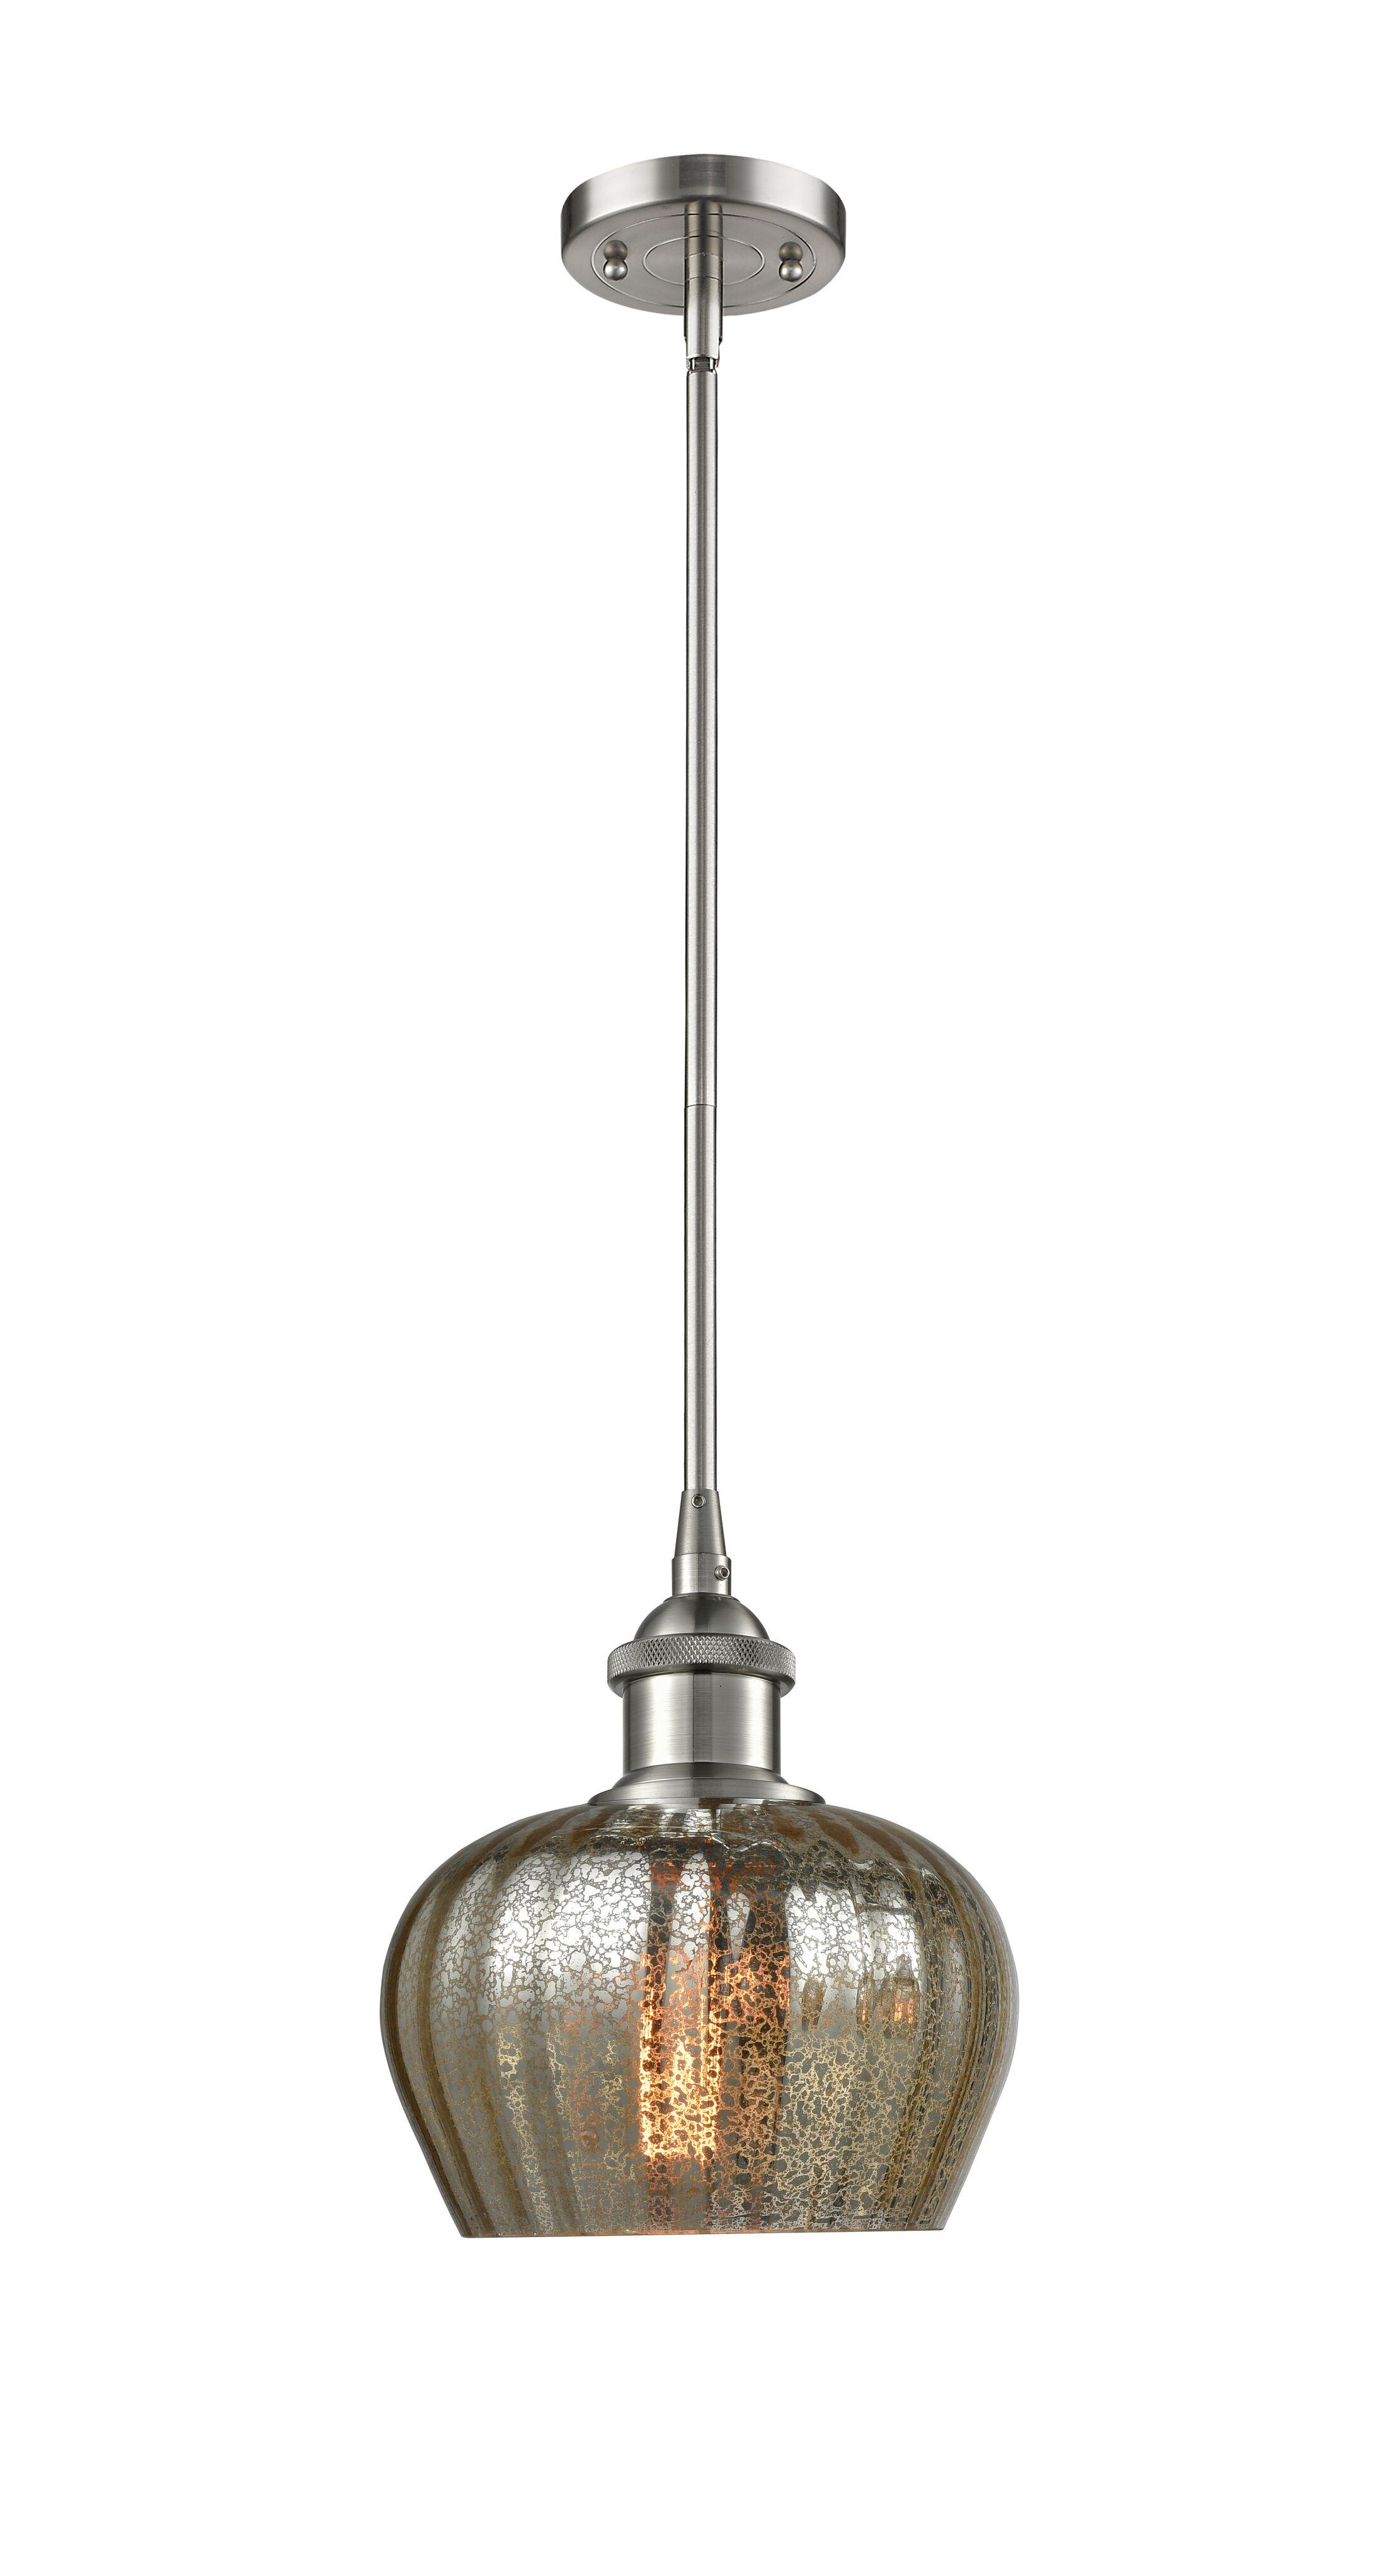 Dooling 1-Light Globe Pendant Finish: Brushed Satin Nickel, Shade Color: Clear